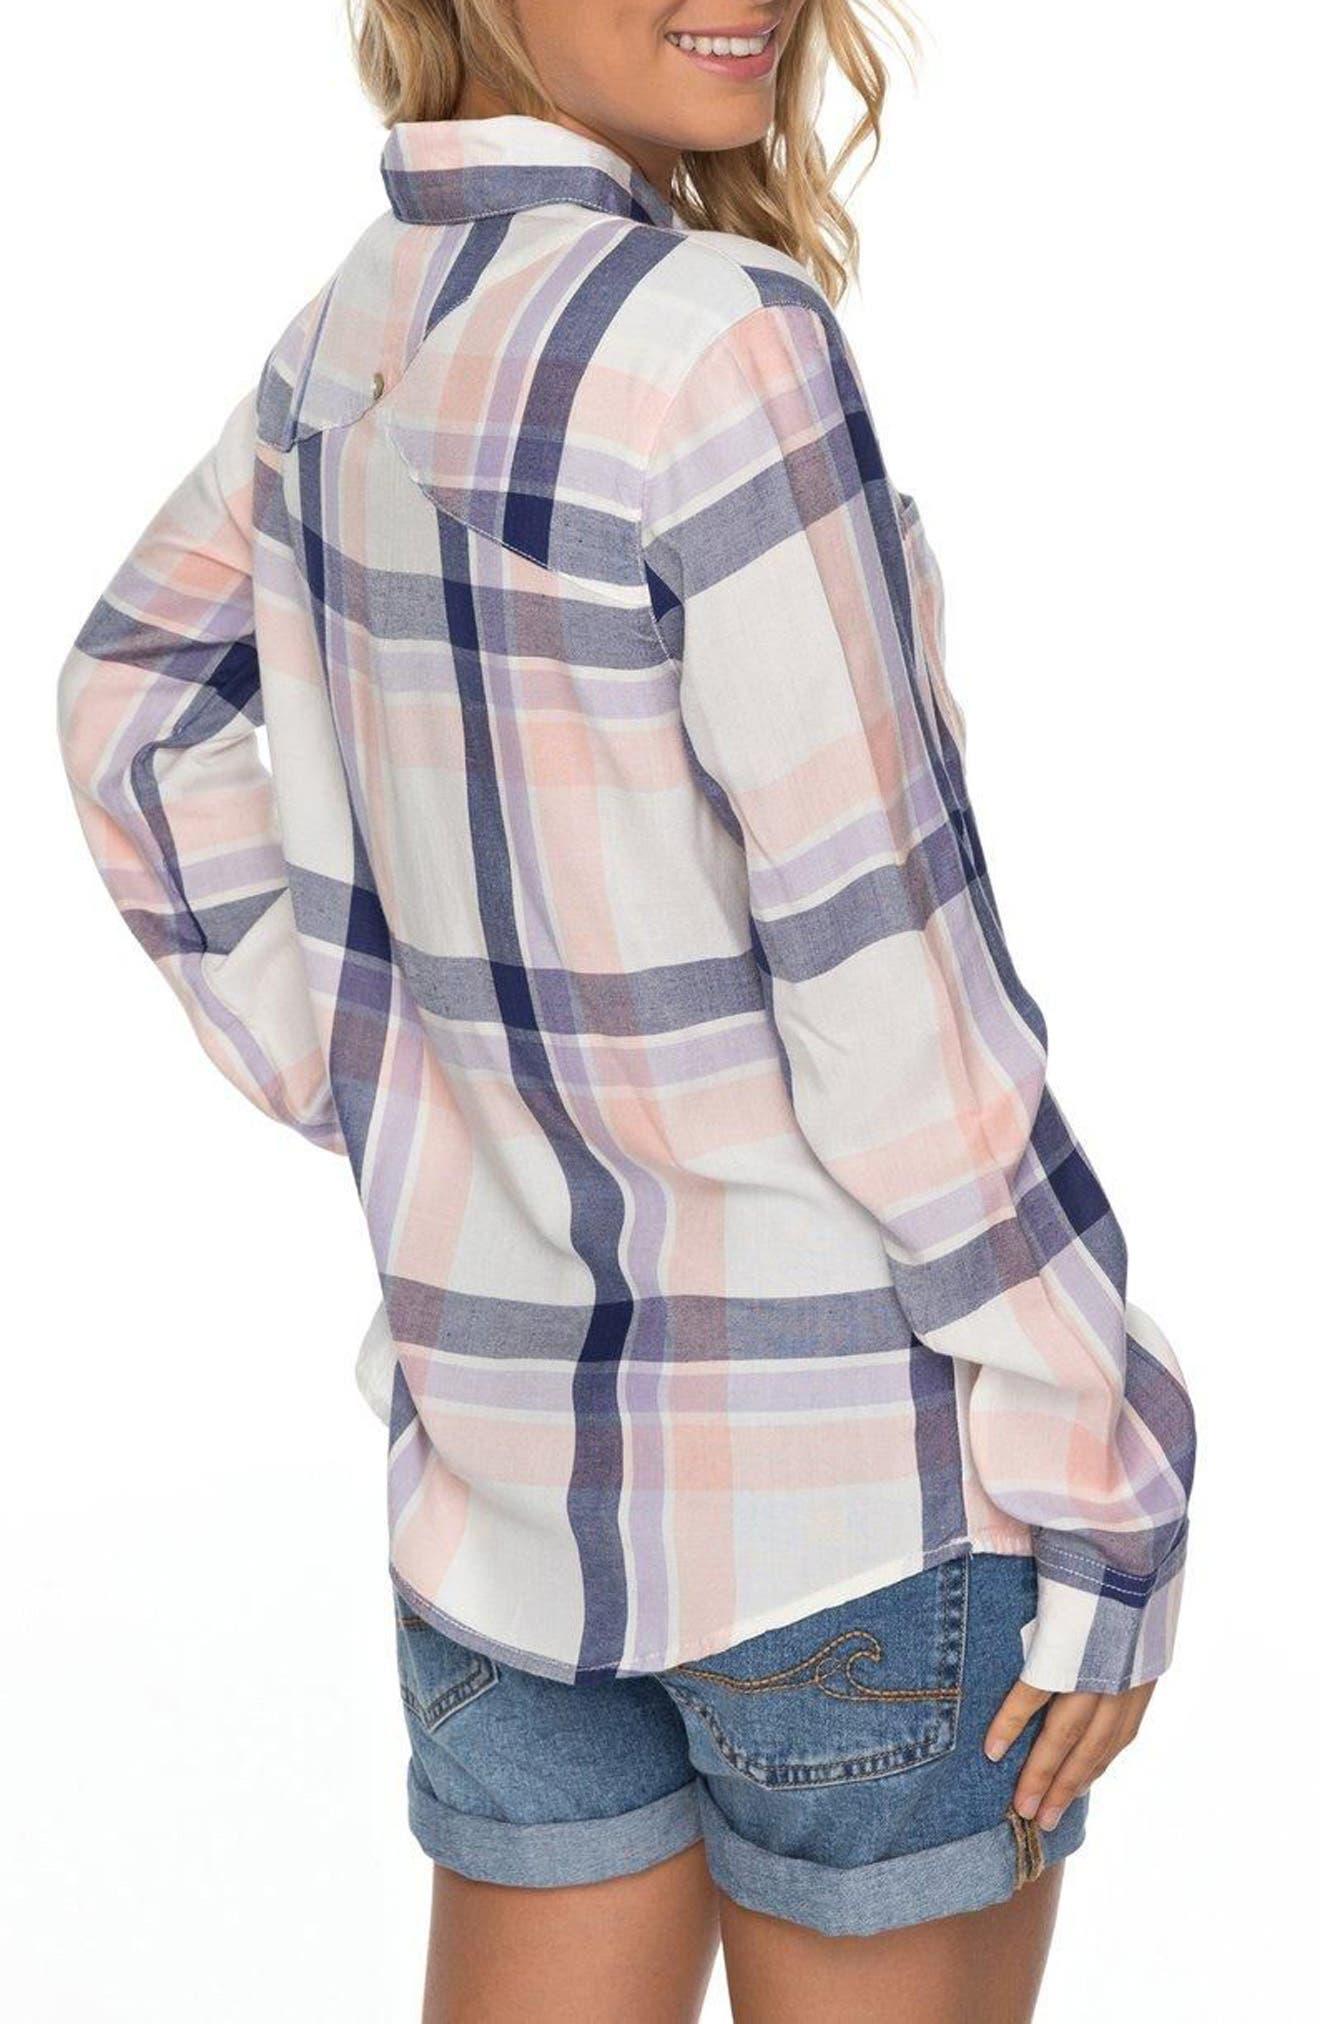 Setai Miami Plaid Shirt,                             Alternate thumbnail 2, color,                             101